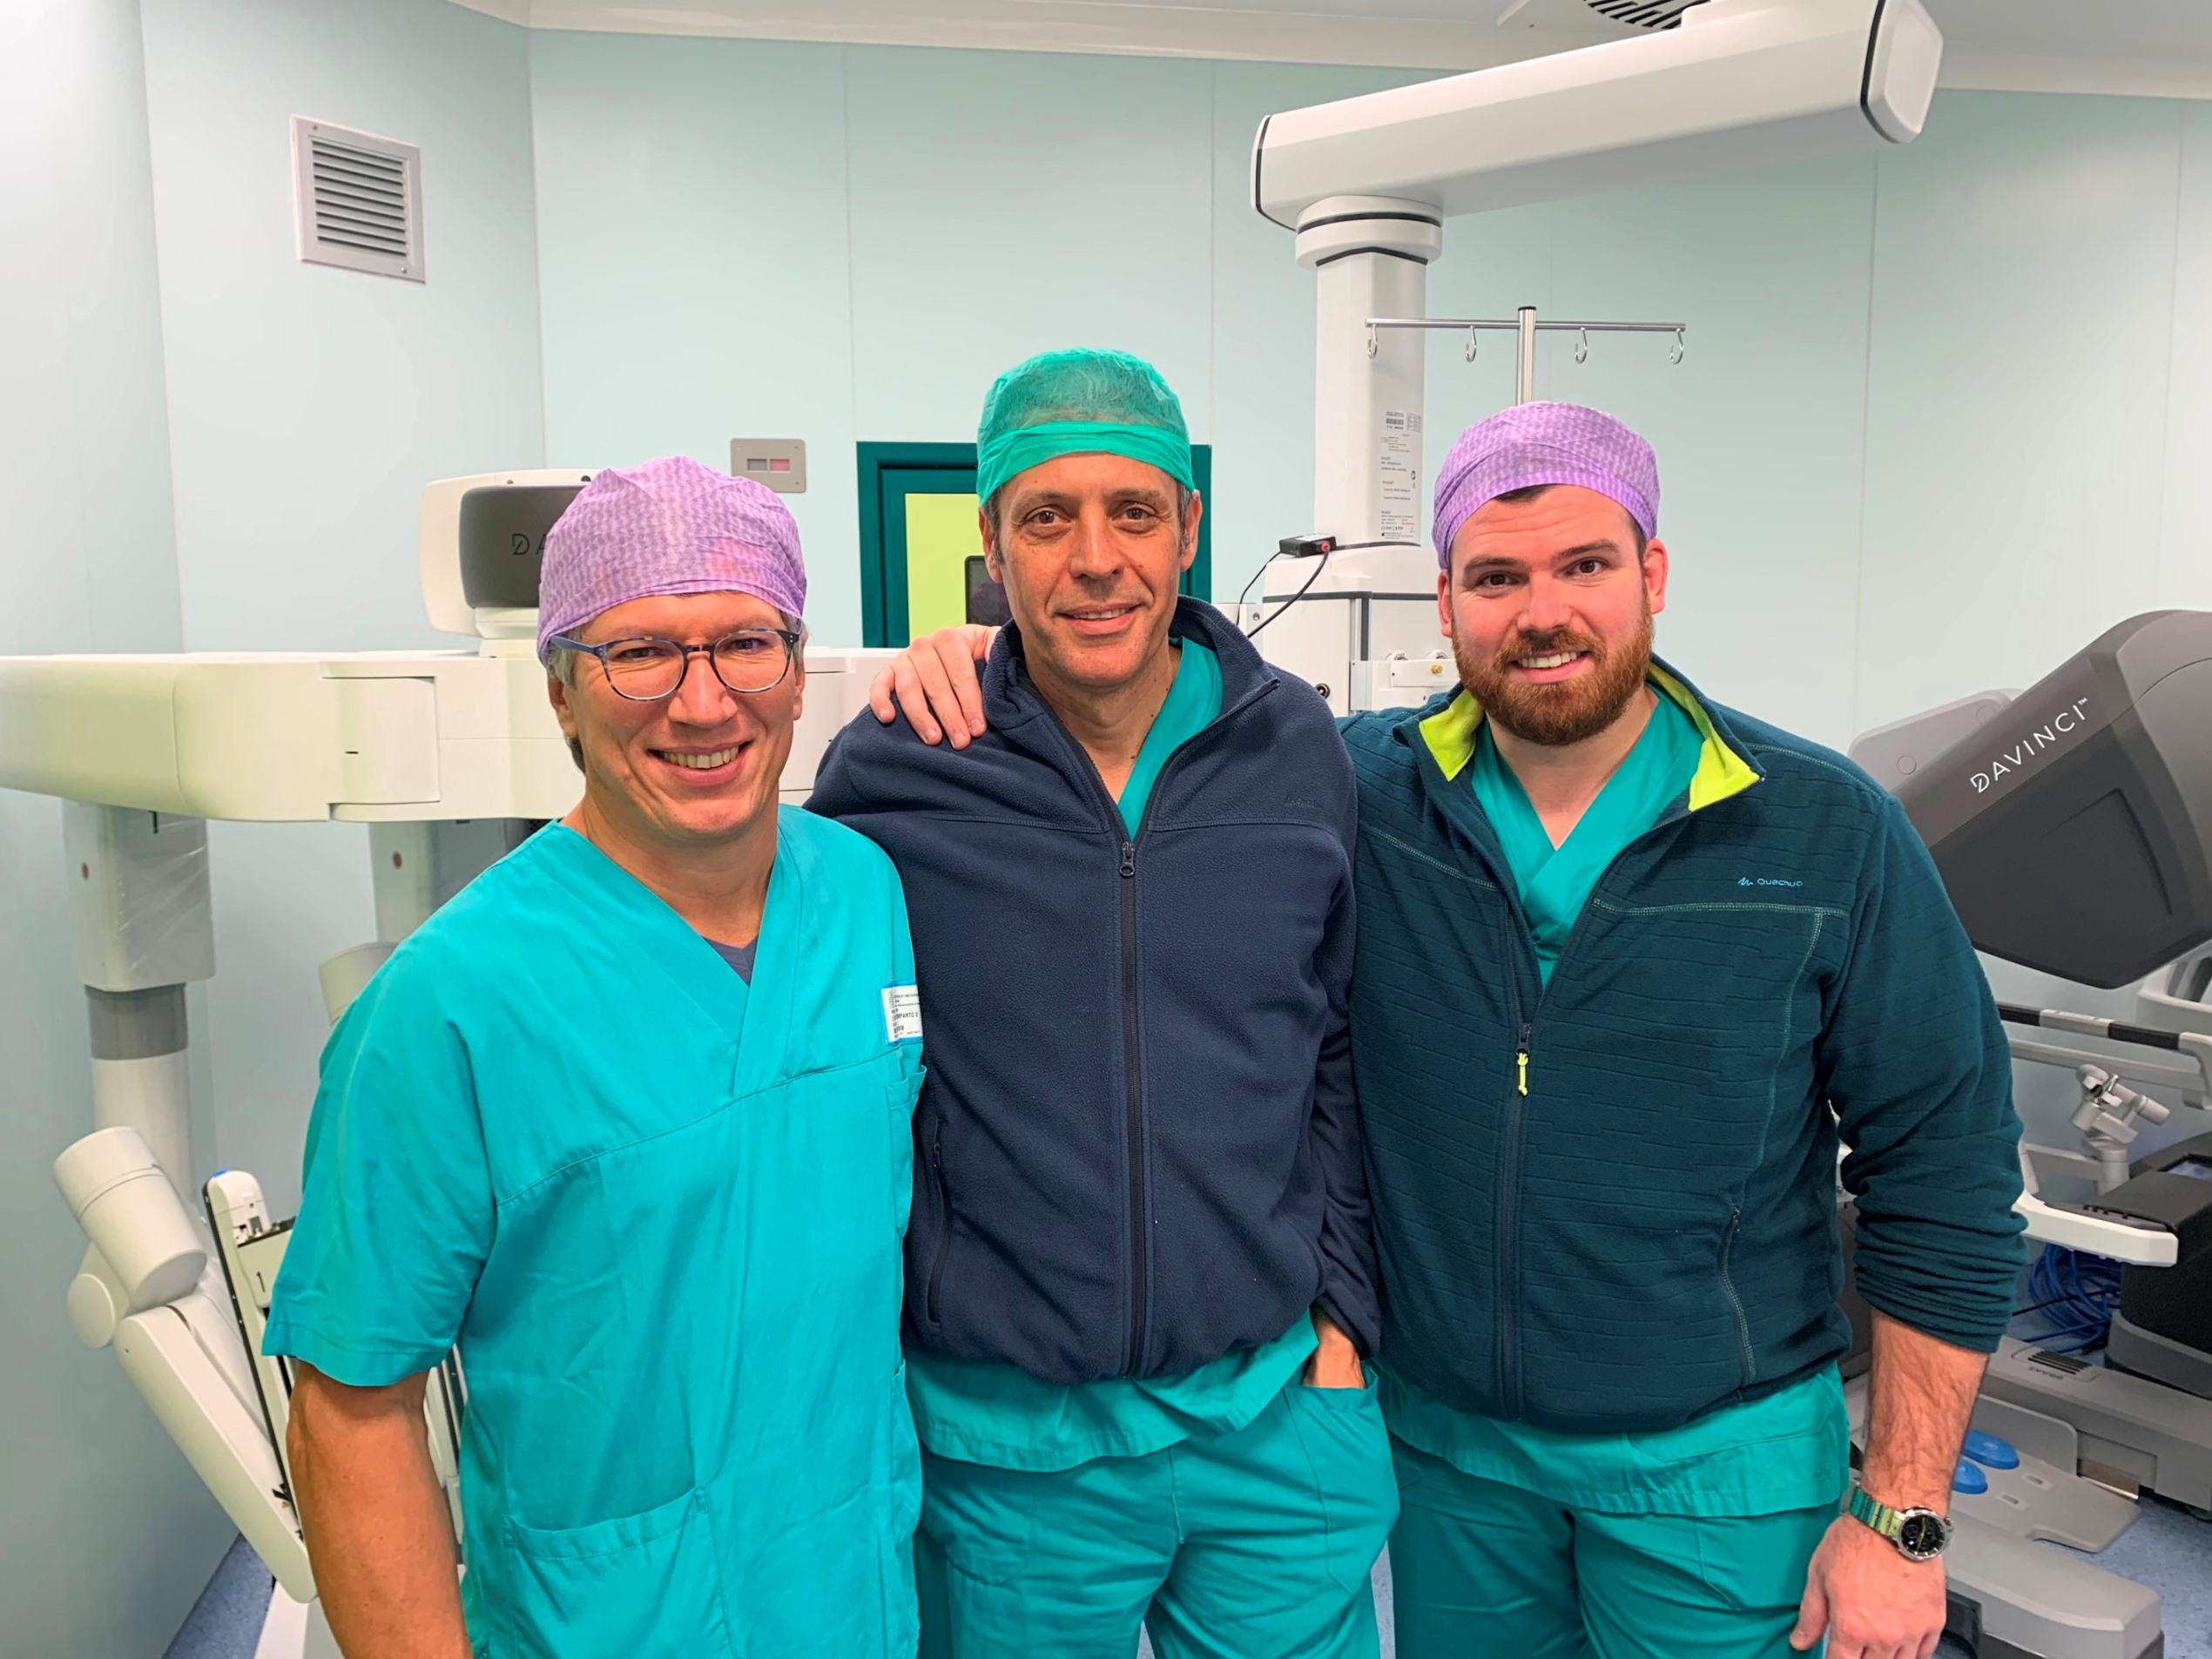 intervento prostata parma city